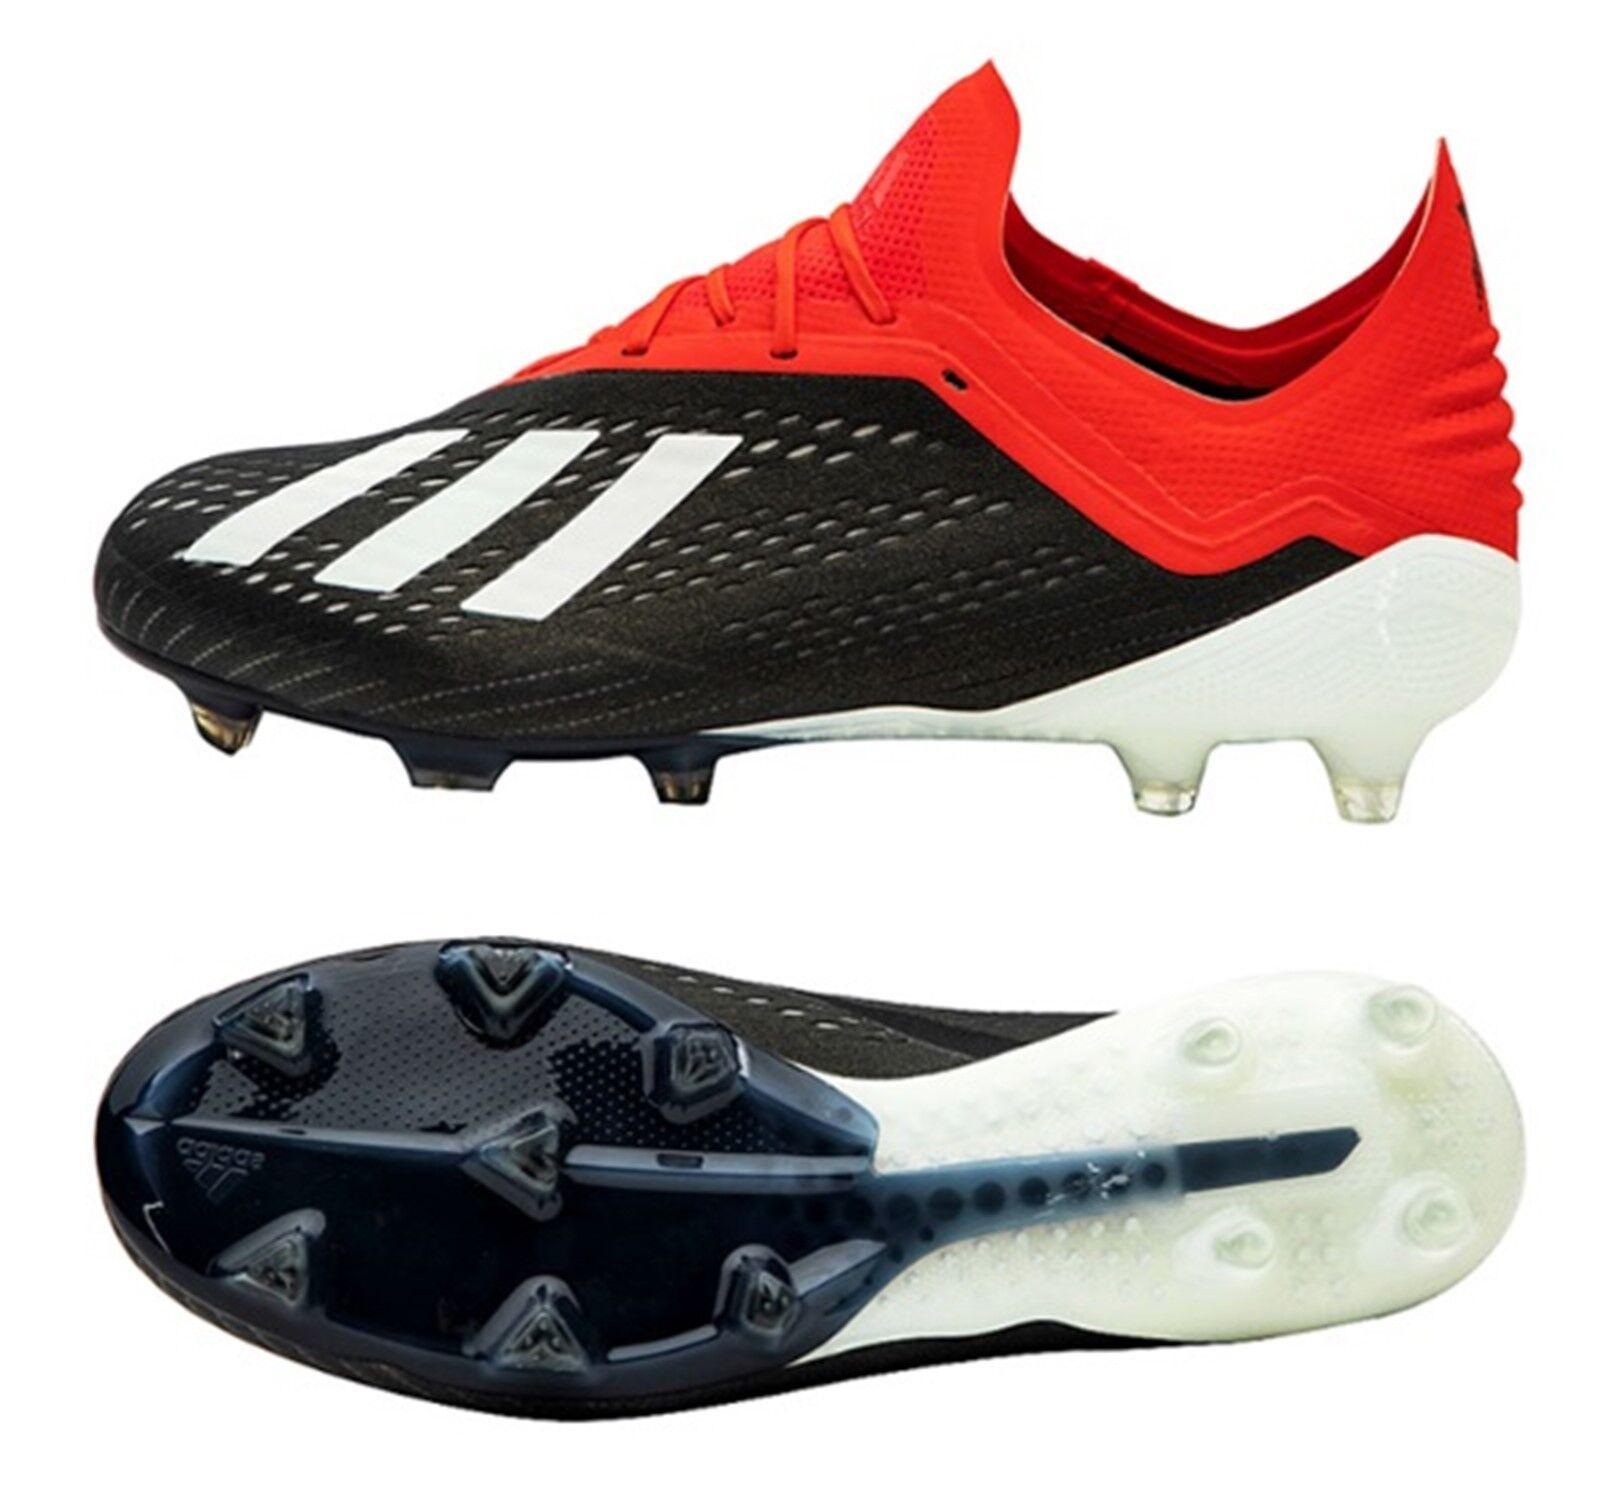 Adidas Hombres X 18.1 FG Botines De Fútbol Negro Rojo Fútbol Zapatos Bota Spike BB9345